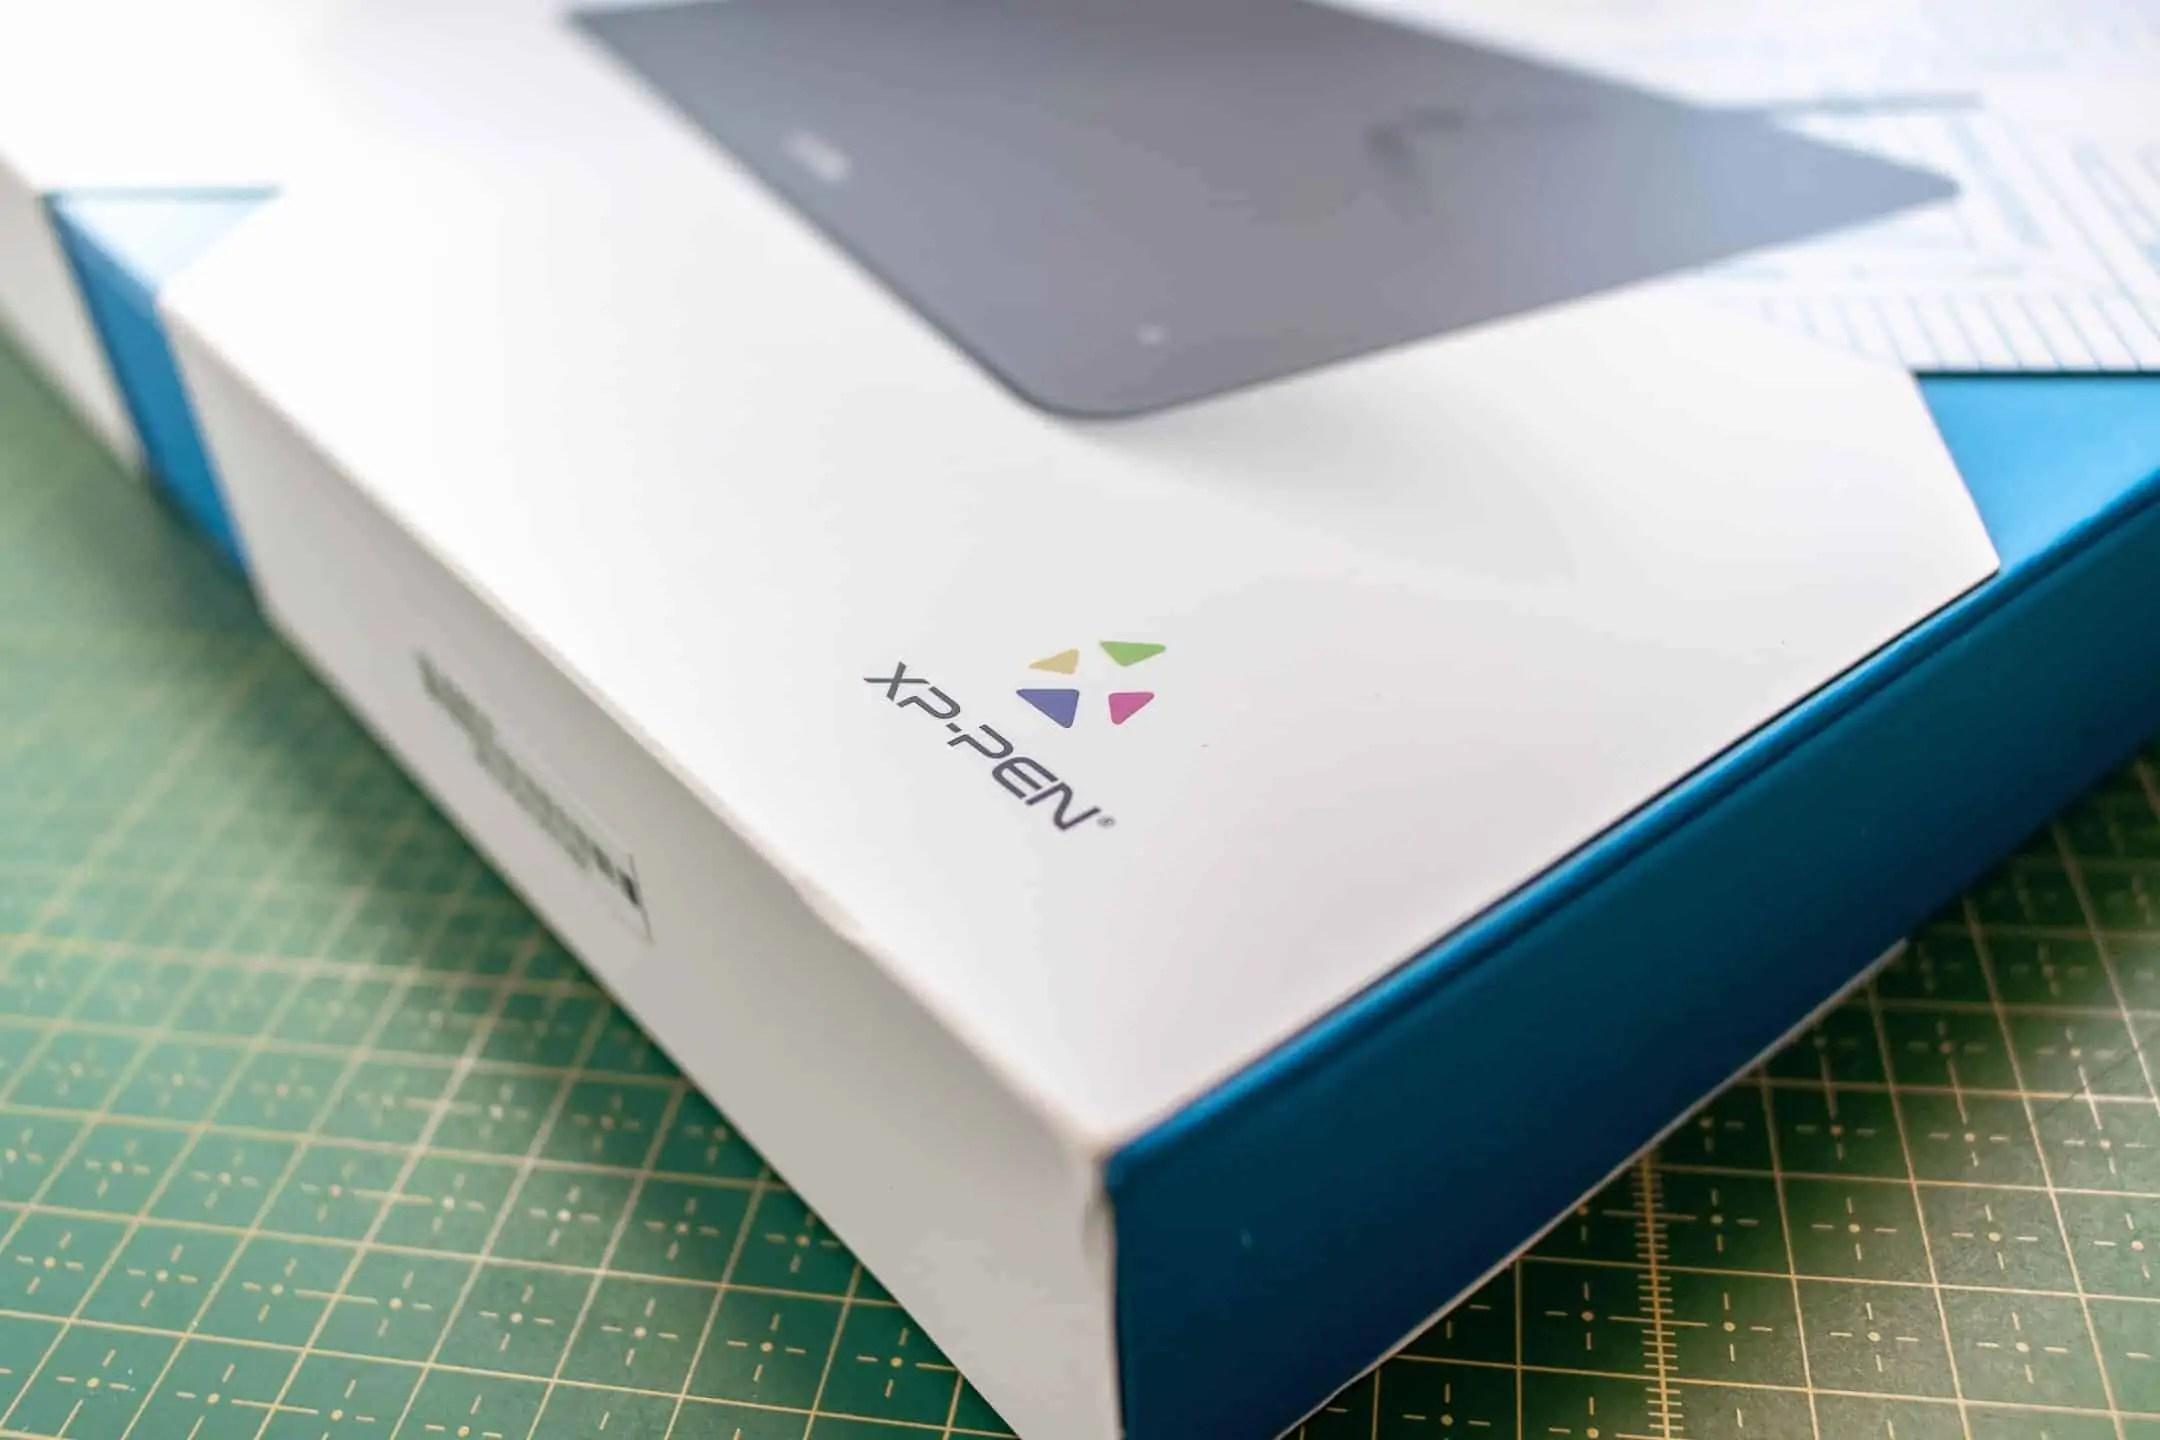 xppen logo - Praca z tabletem graficznym XP PEN Deco 01 v2